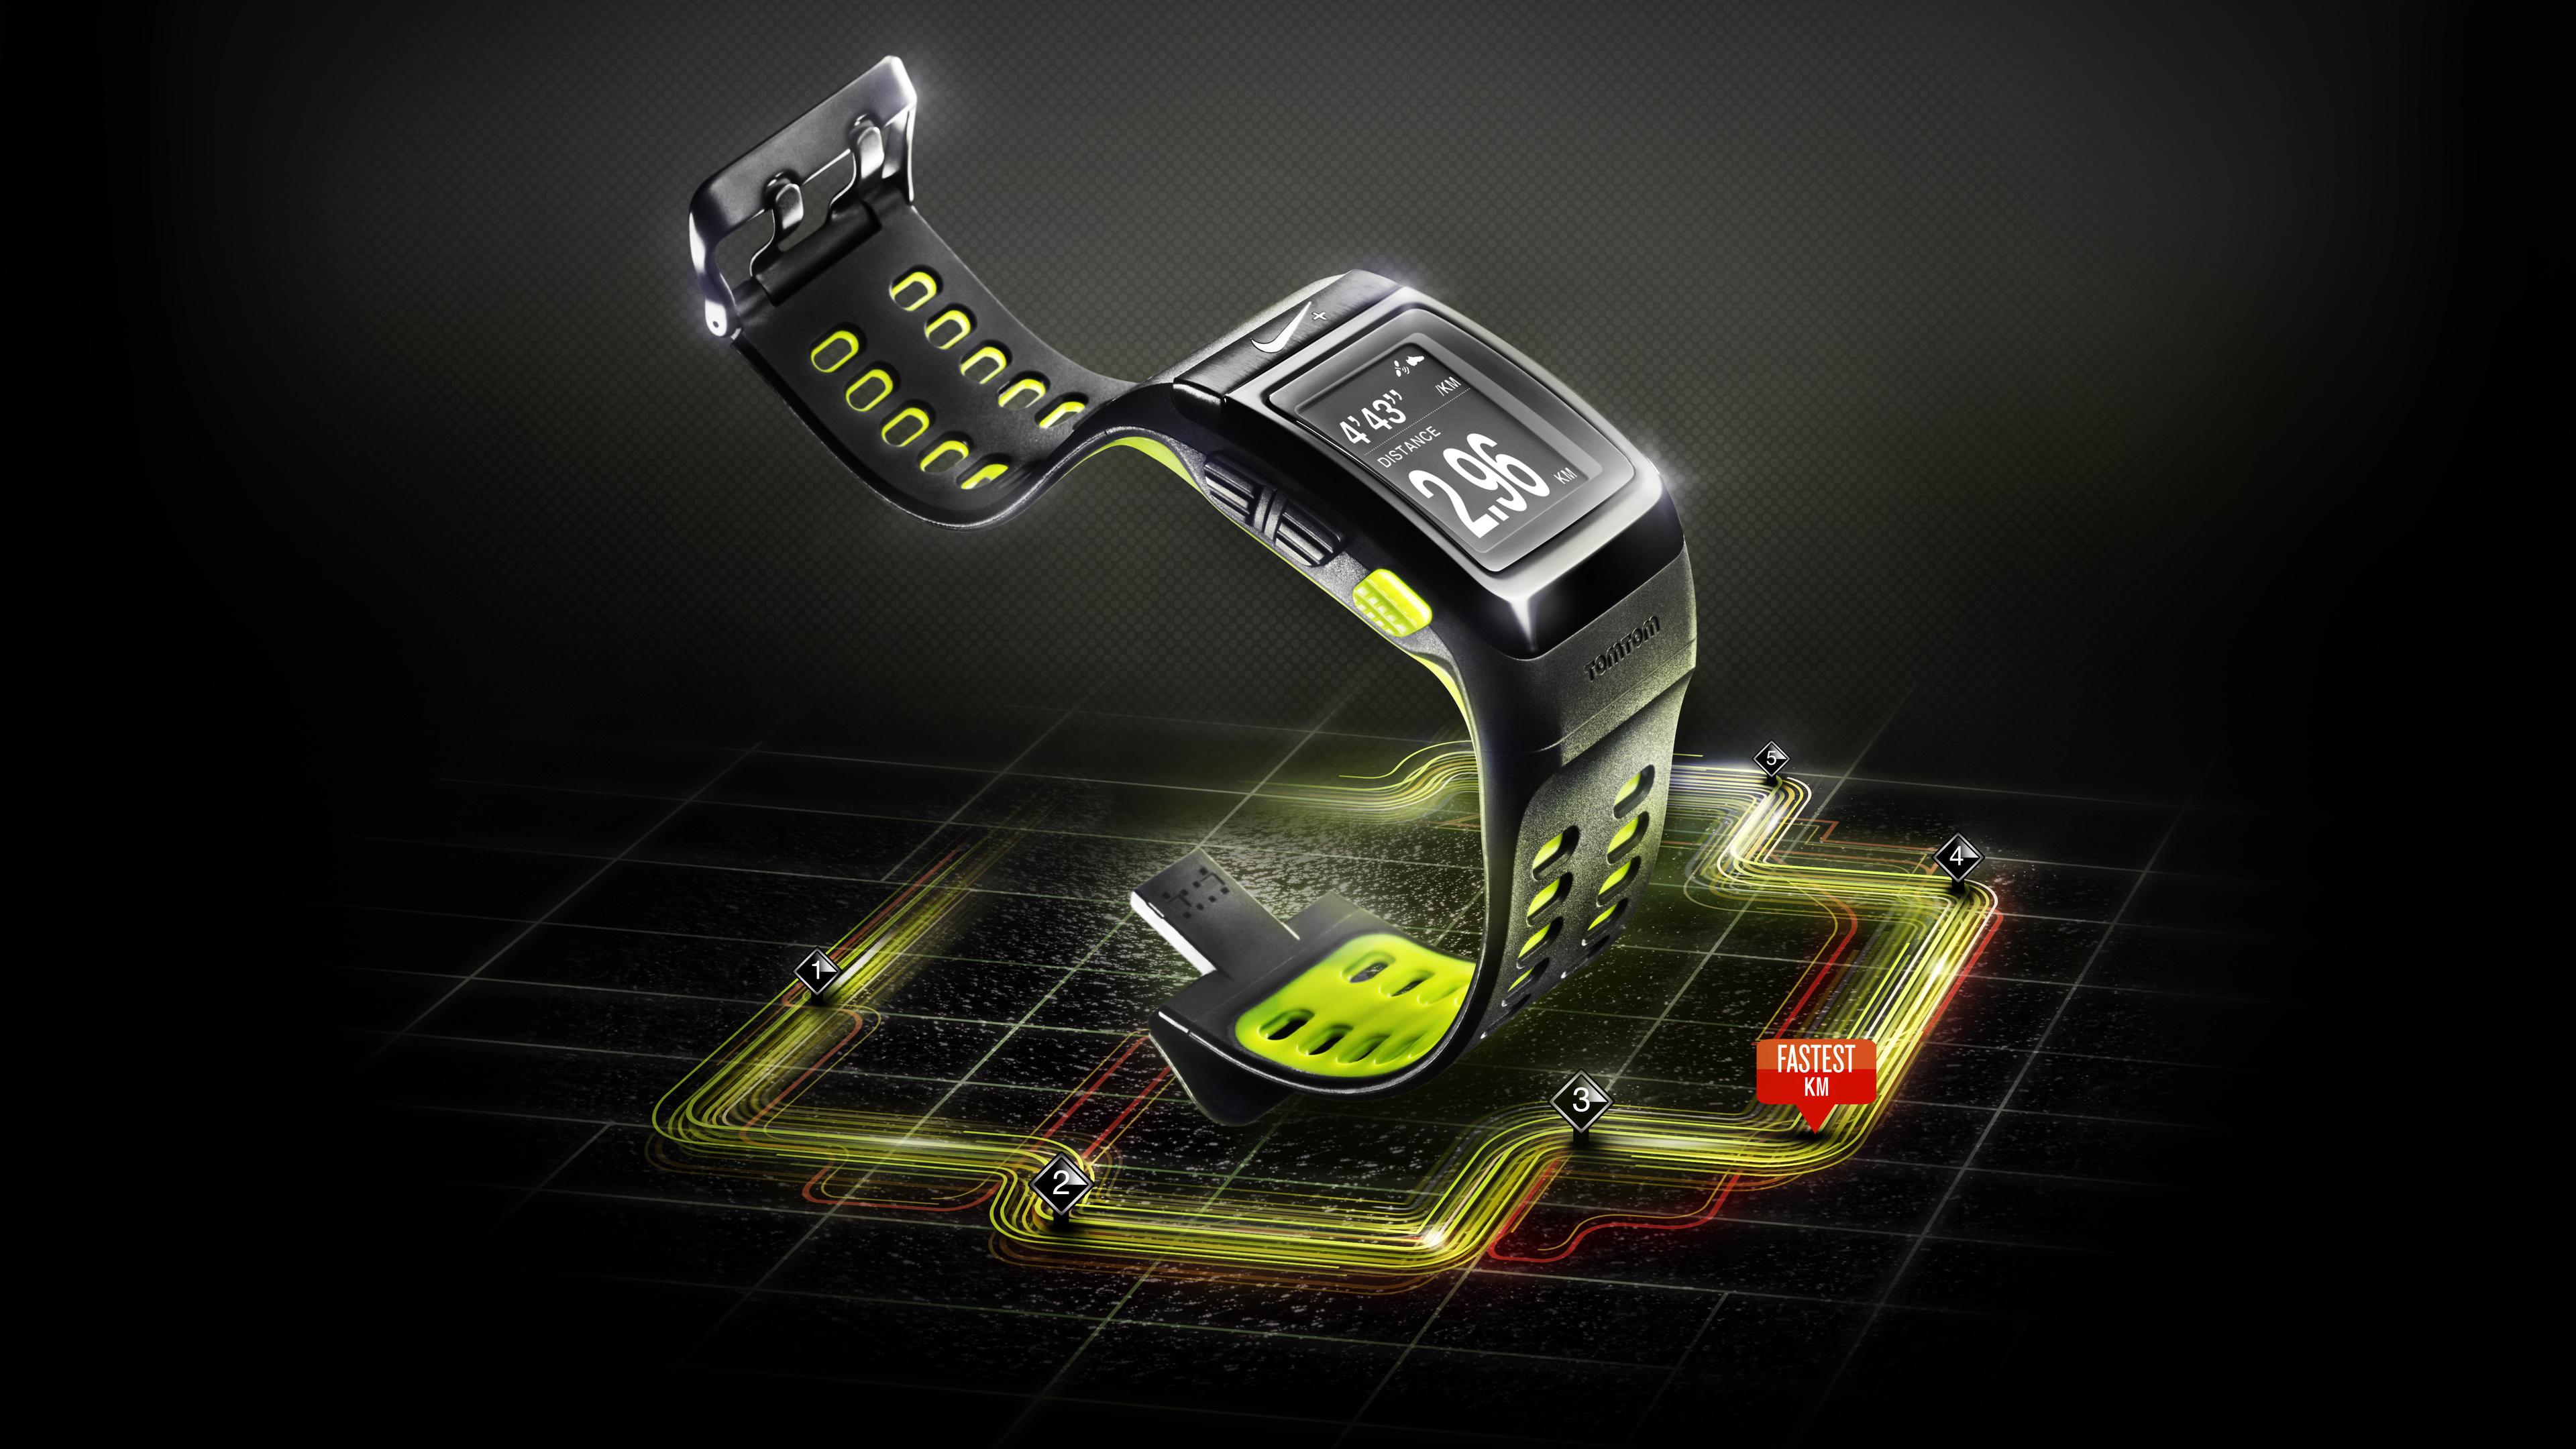 Картинка: Найк, часы, бренд, технология, схема, цифры, чёрный фон